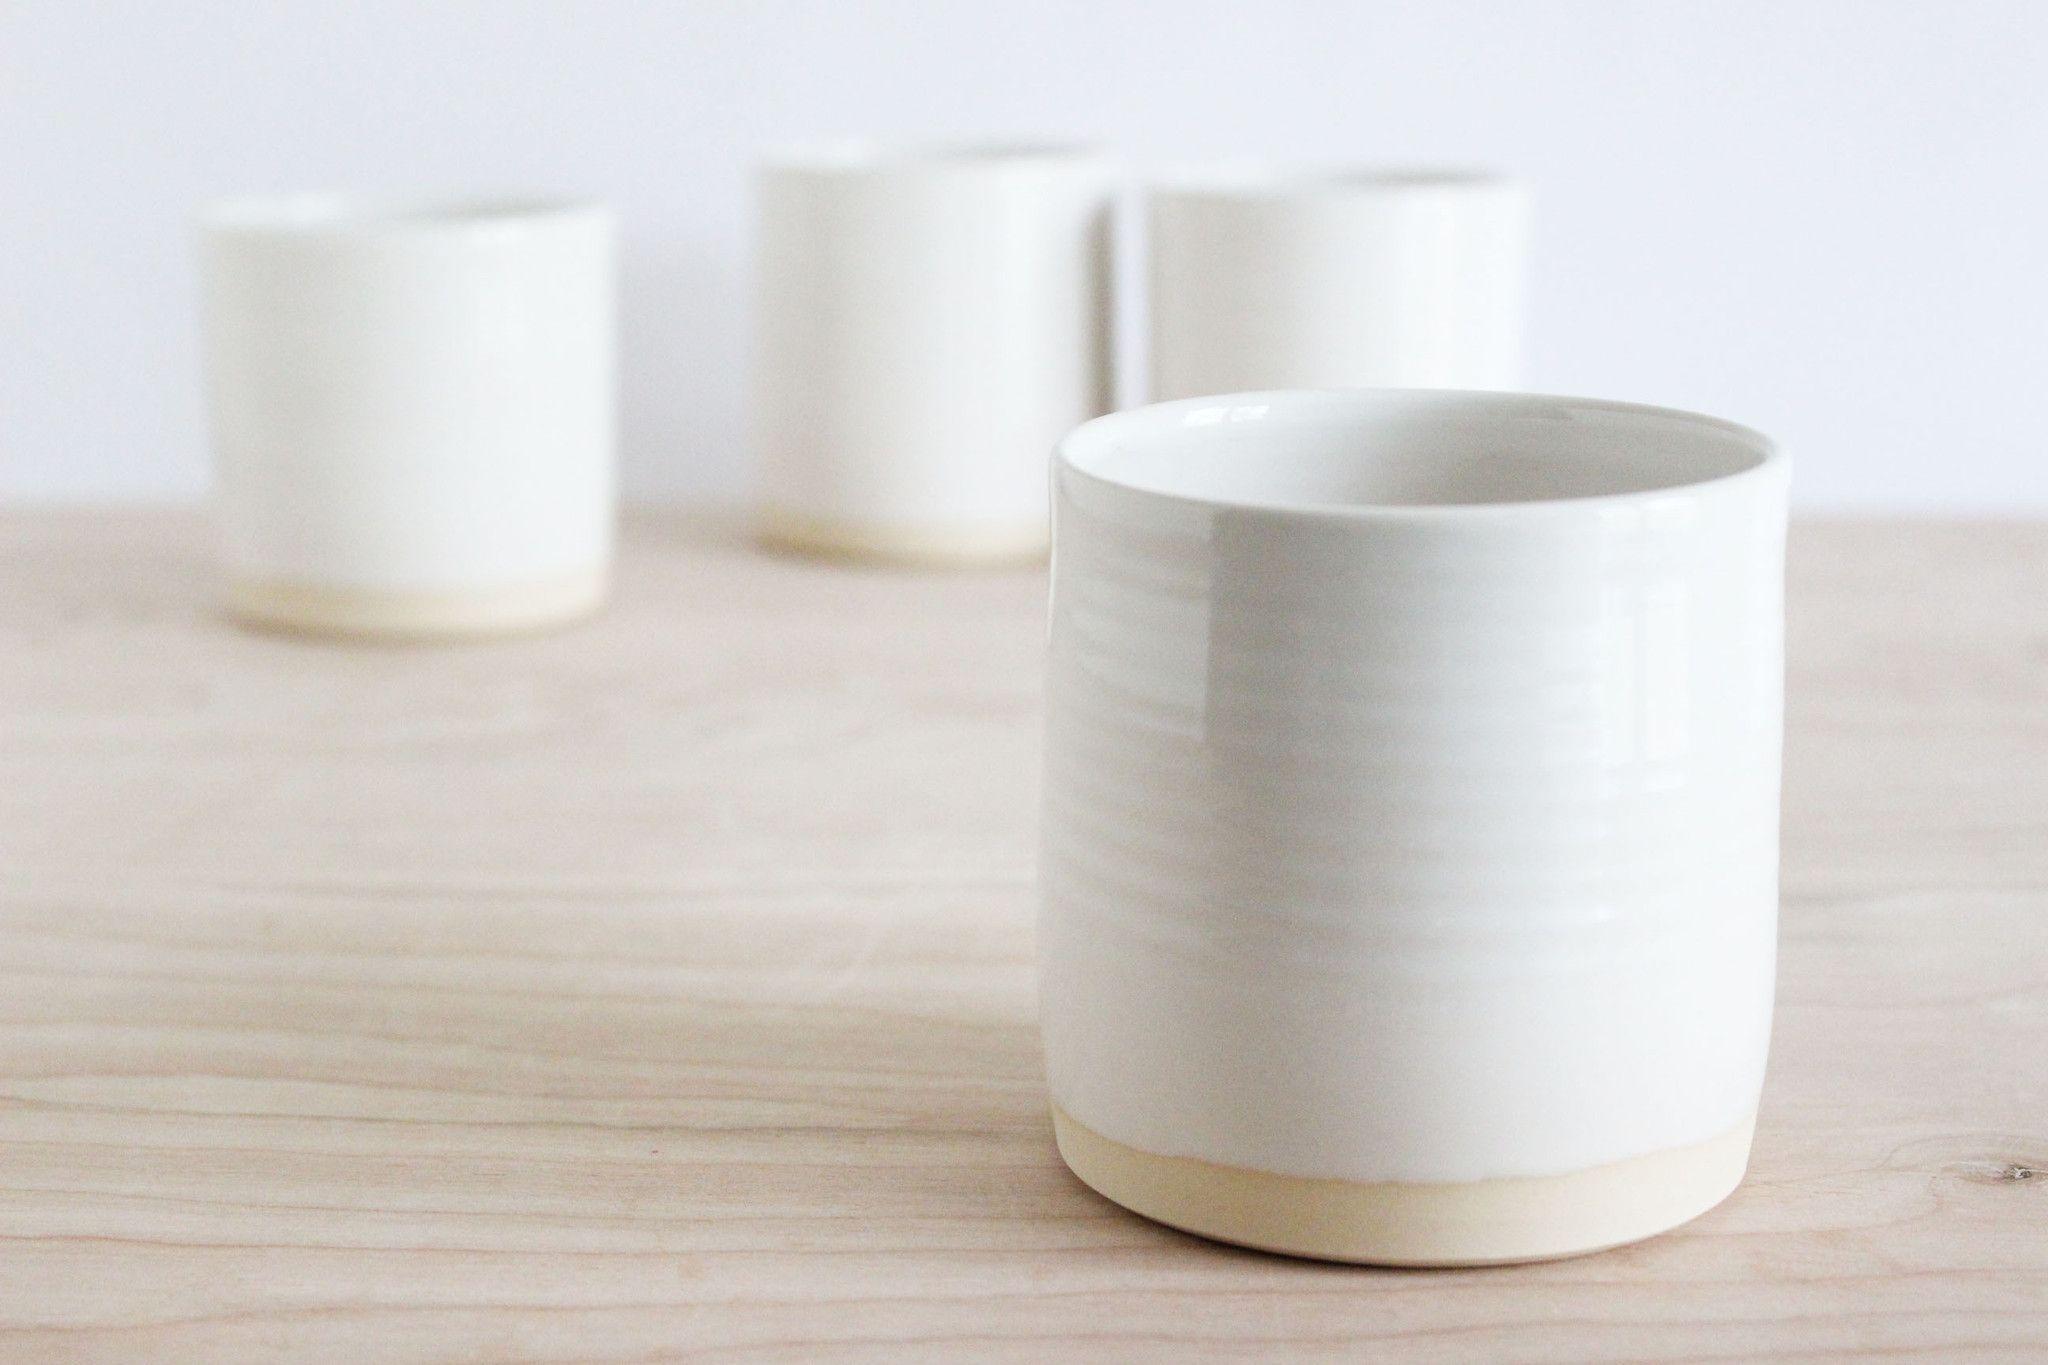 Julia Paul Pottery handmade – Julia Paul POTTERY